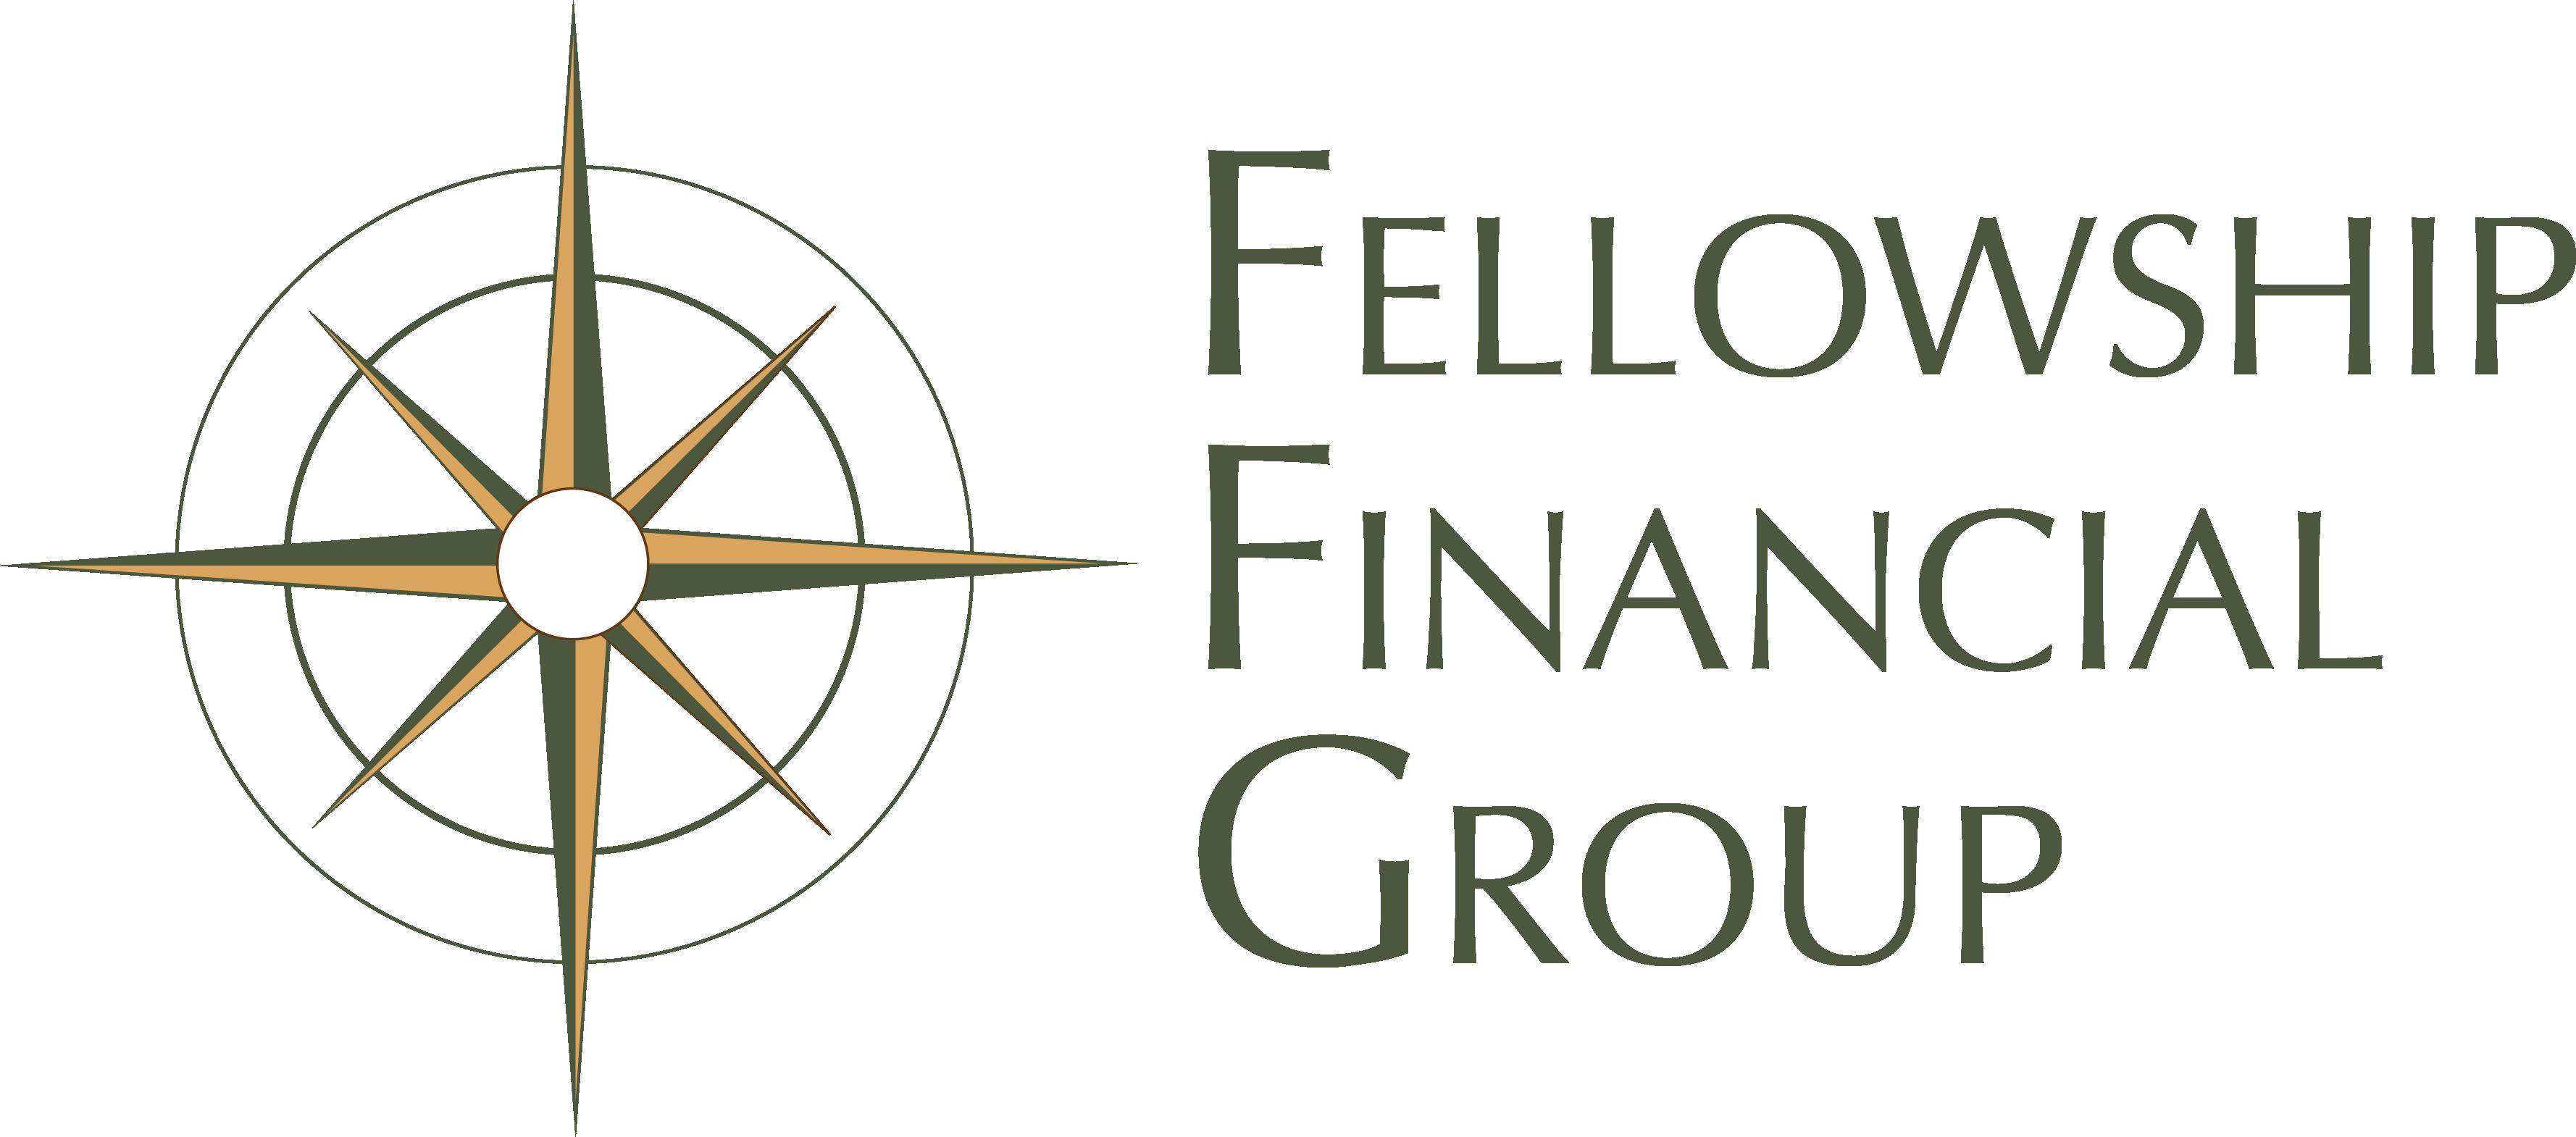 Fellowship Financial Group